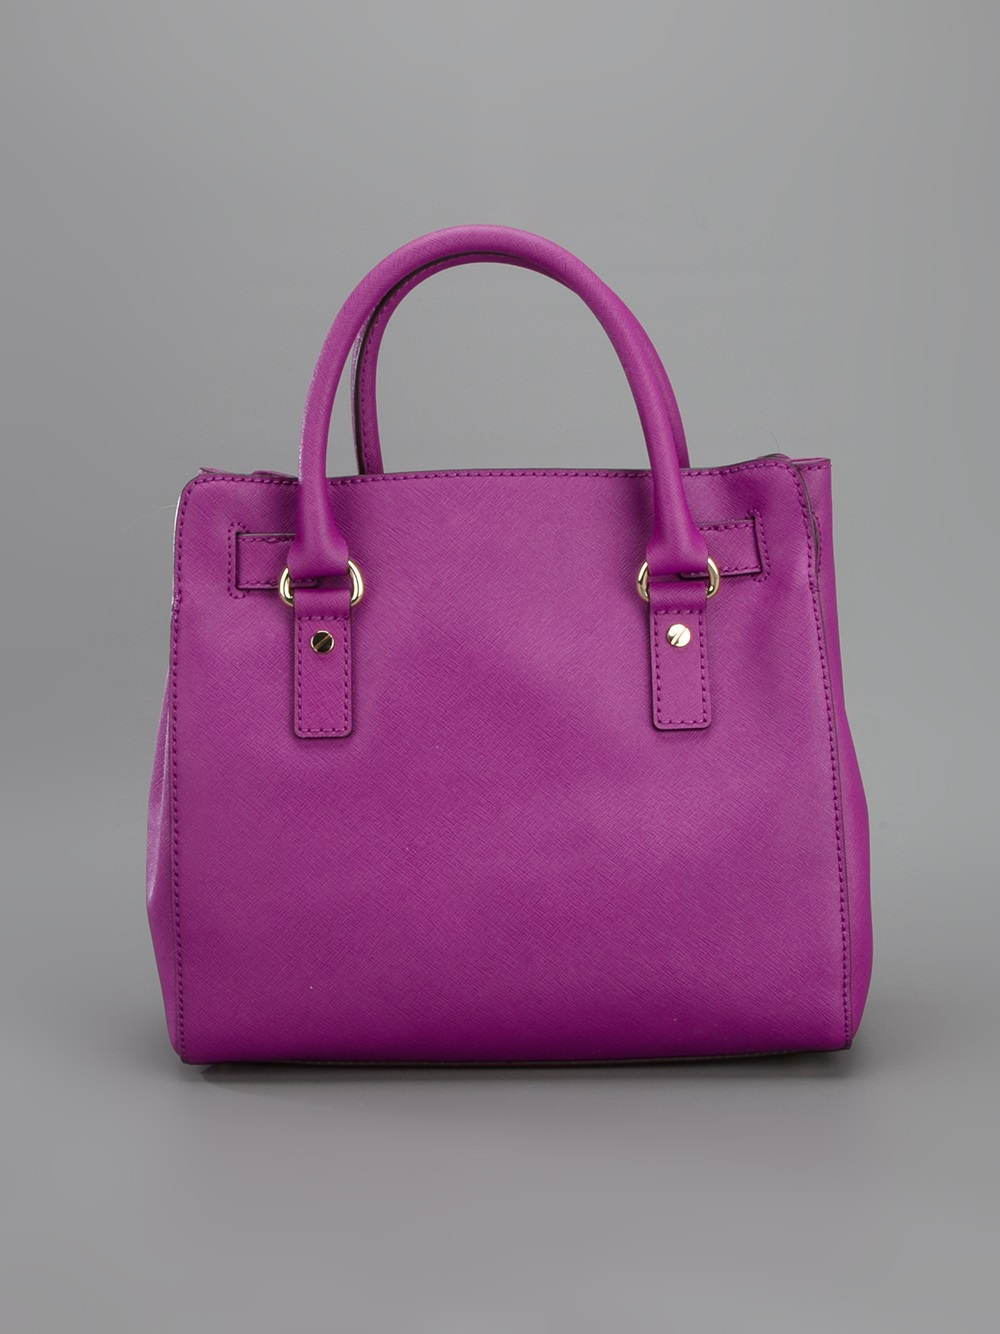 MICHAEL Michael Kors Hamilton Tote in Pink & Purple (Purple)